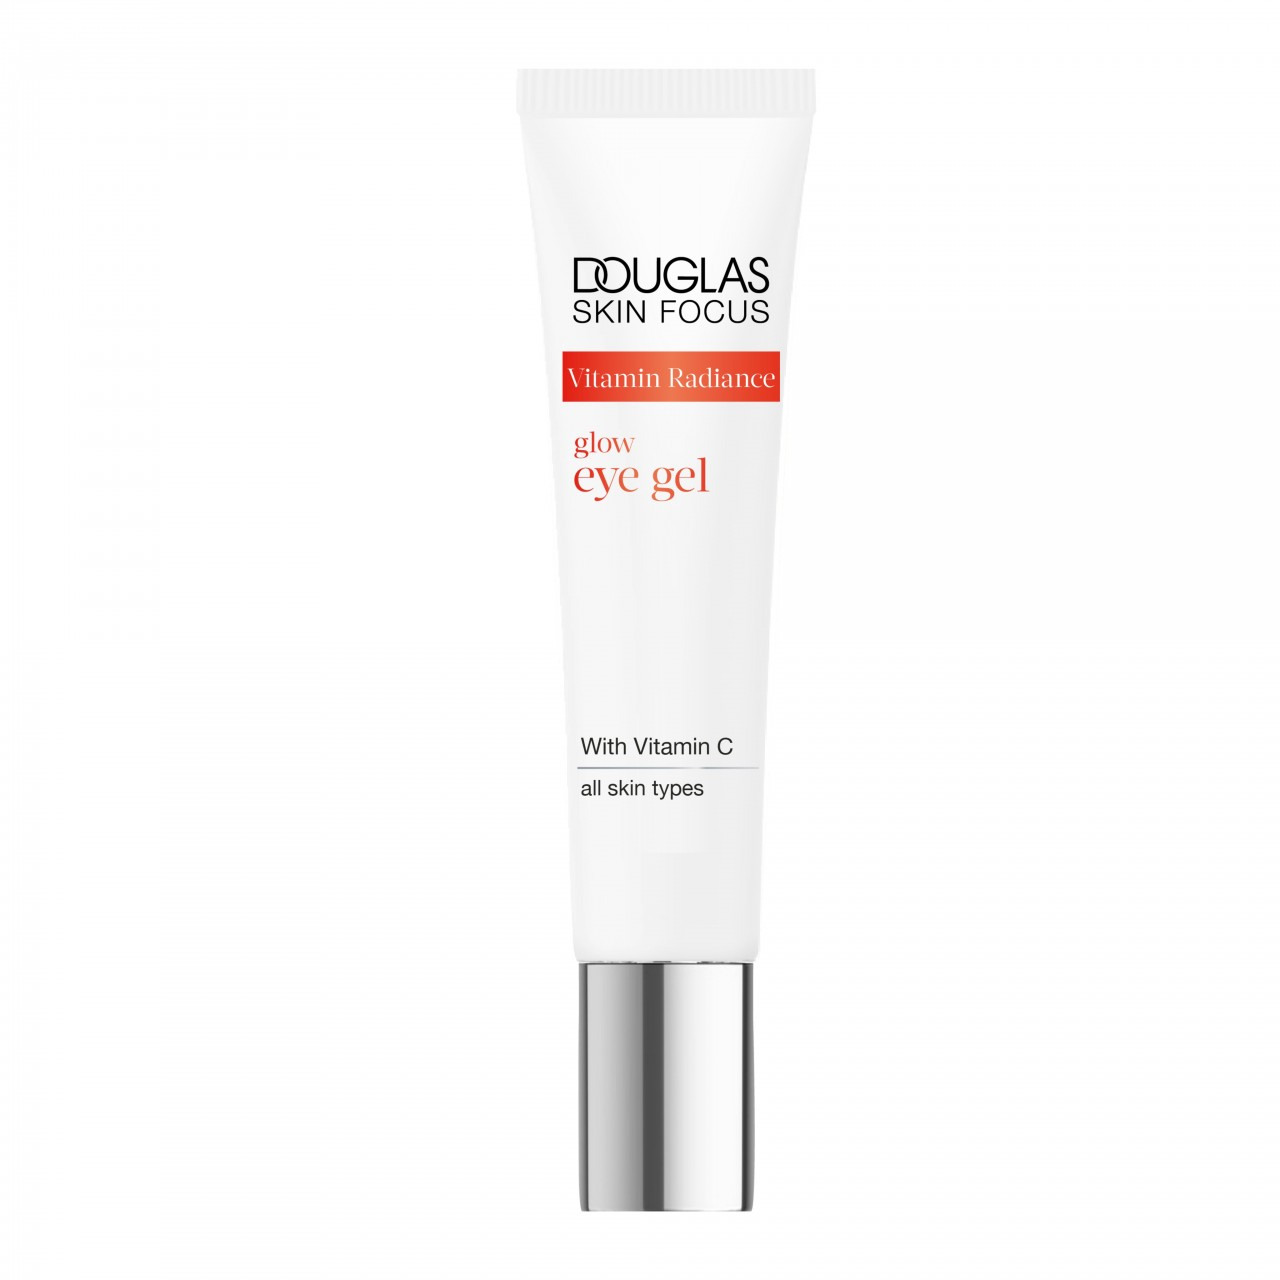 Douglas Focus Glow Eye Gel